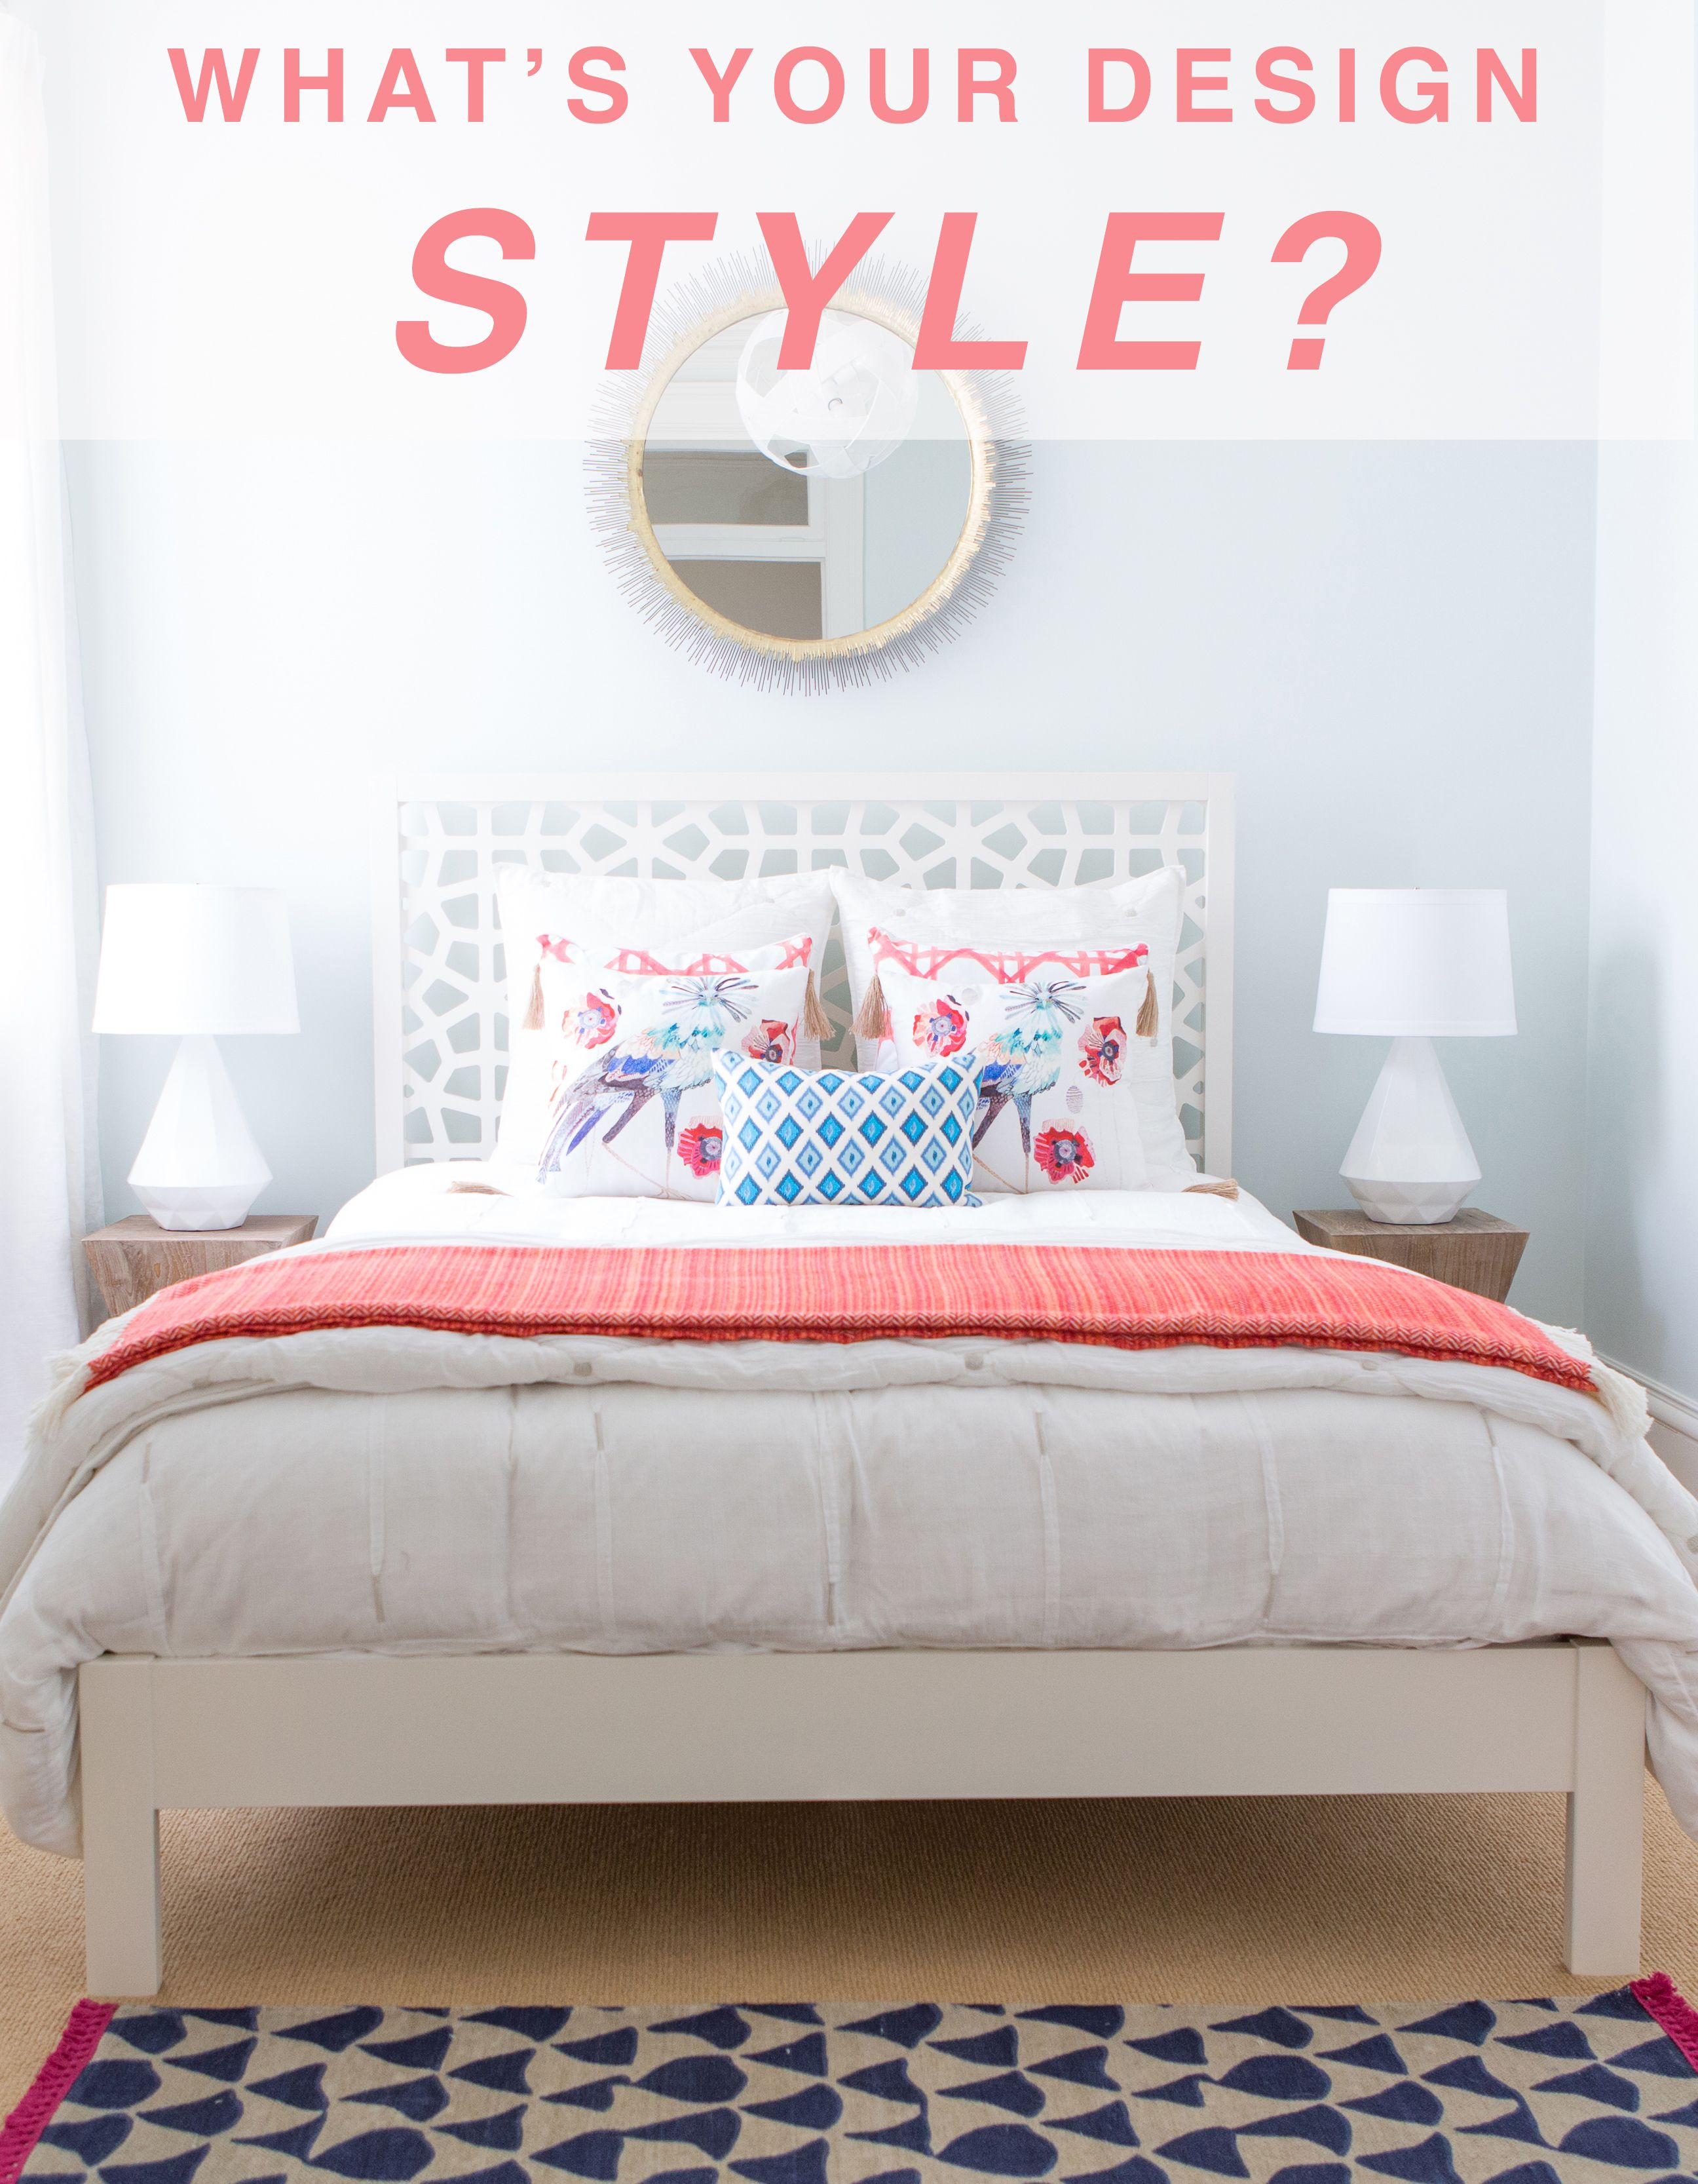 Online Interior Design Top Interior Designers Design Services - How should i design my bedroom quiz